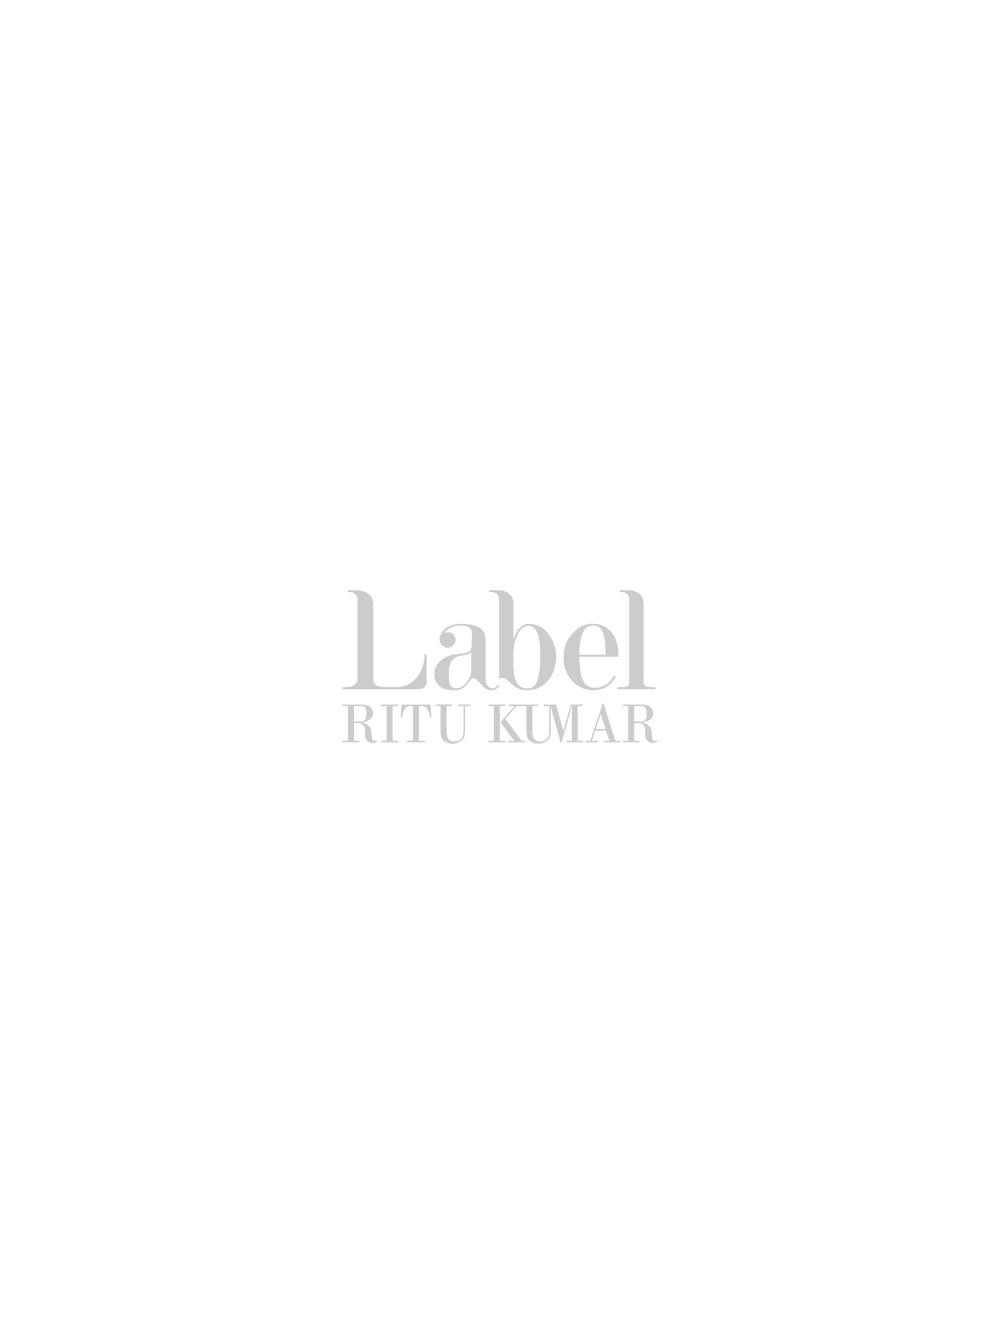 Buy Indian Designer Ivory Printed Long Dress by labelritukumar Online d0f4c02dcfe7